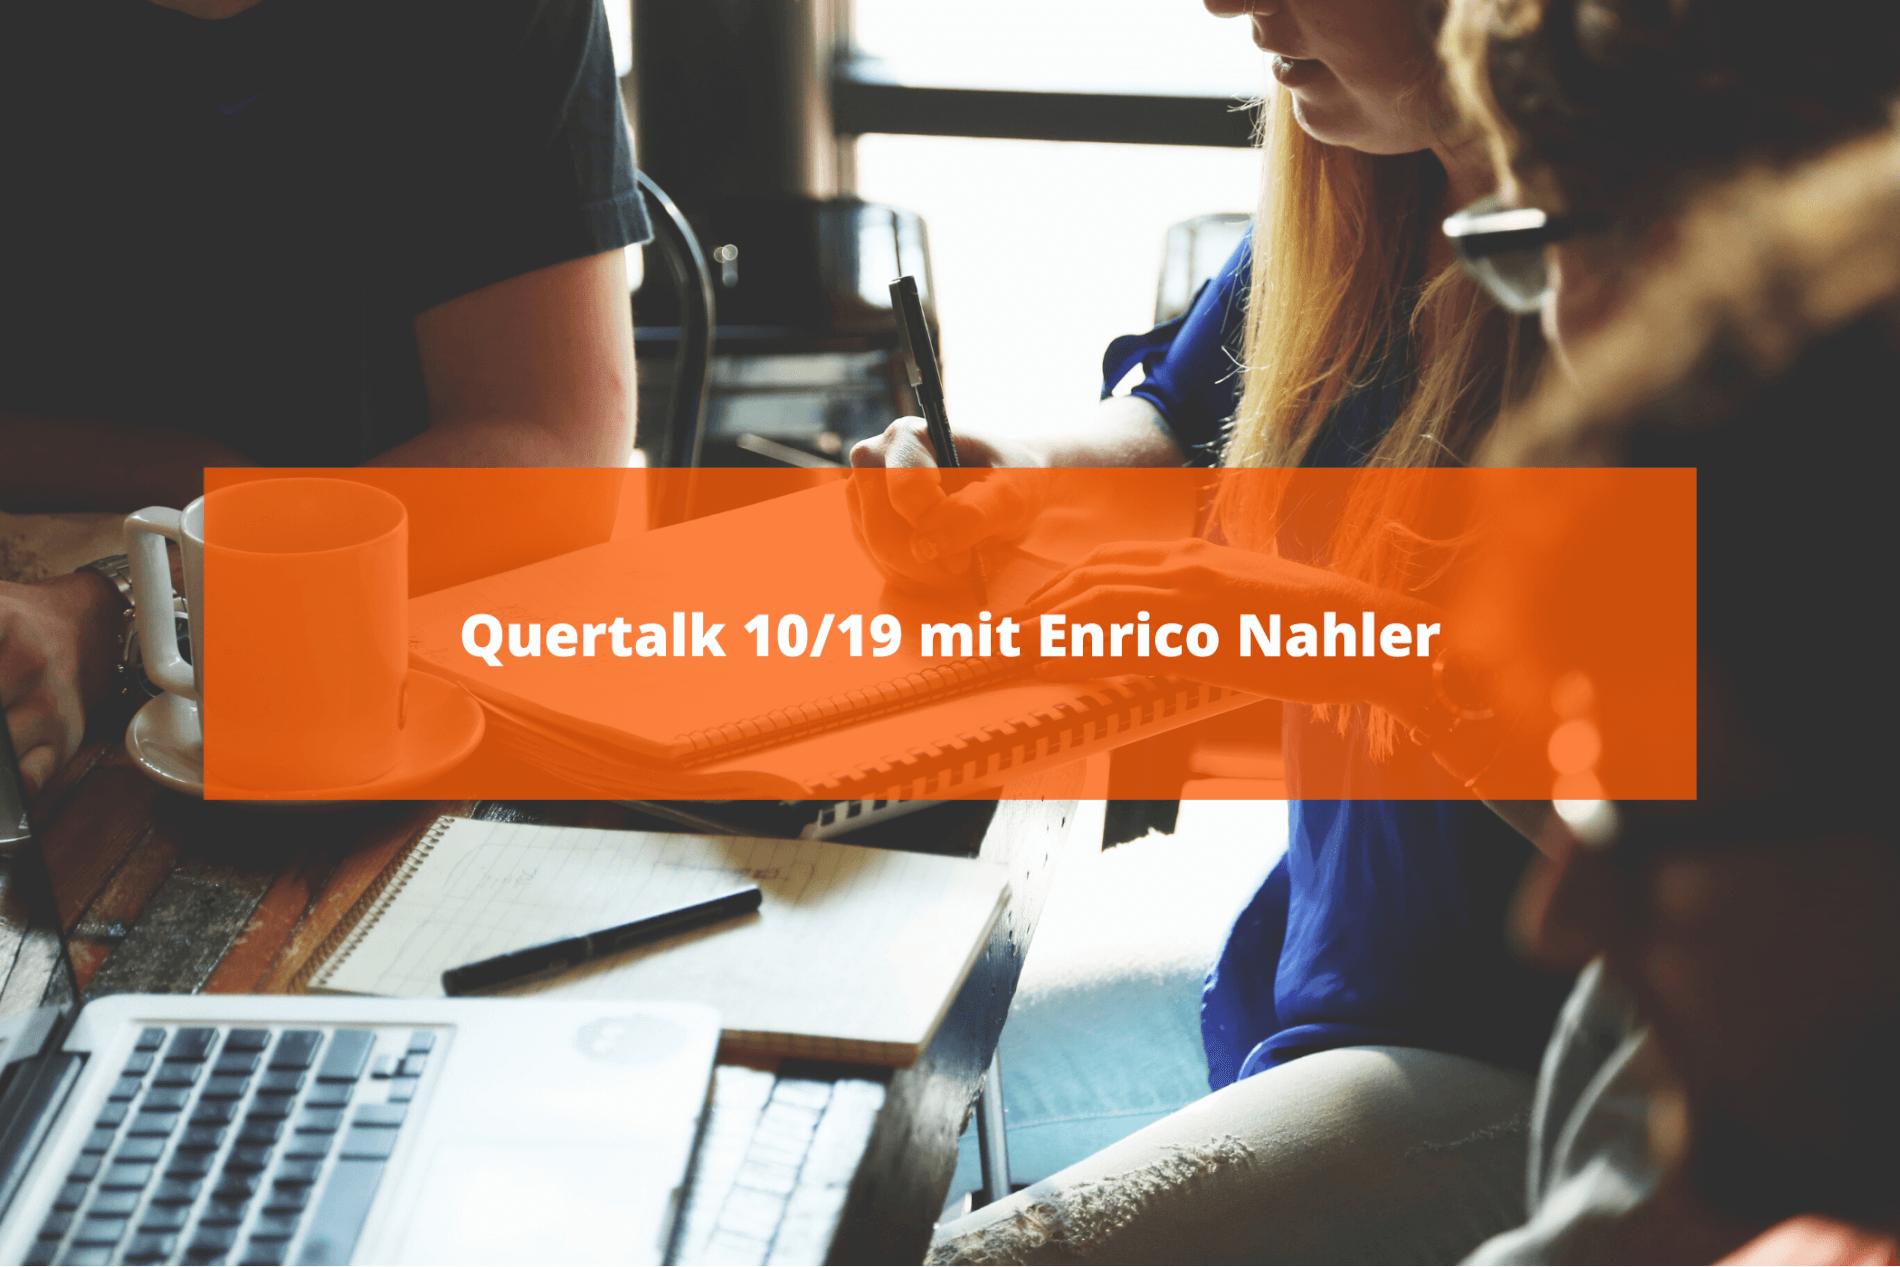 Quertalk 10/19 mit Enrico Nahler